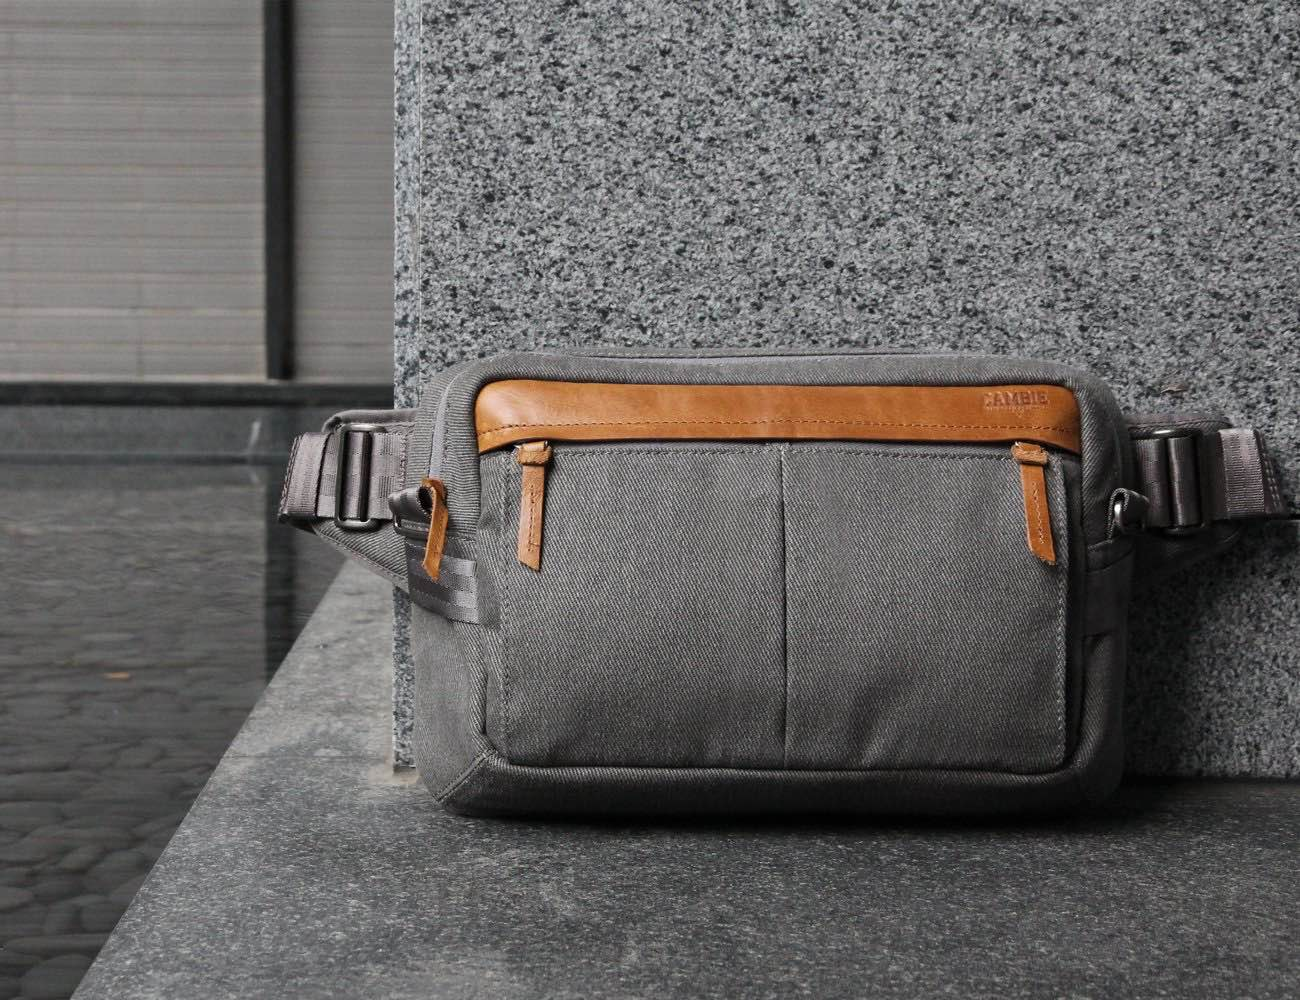 Urban+Pack+%26%238211%3B+A+Versatile+4-in-1+Minimalist+Field+Bag